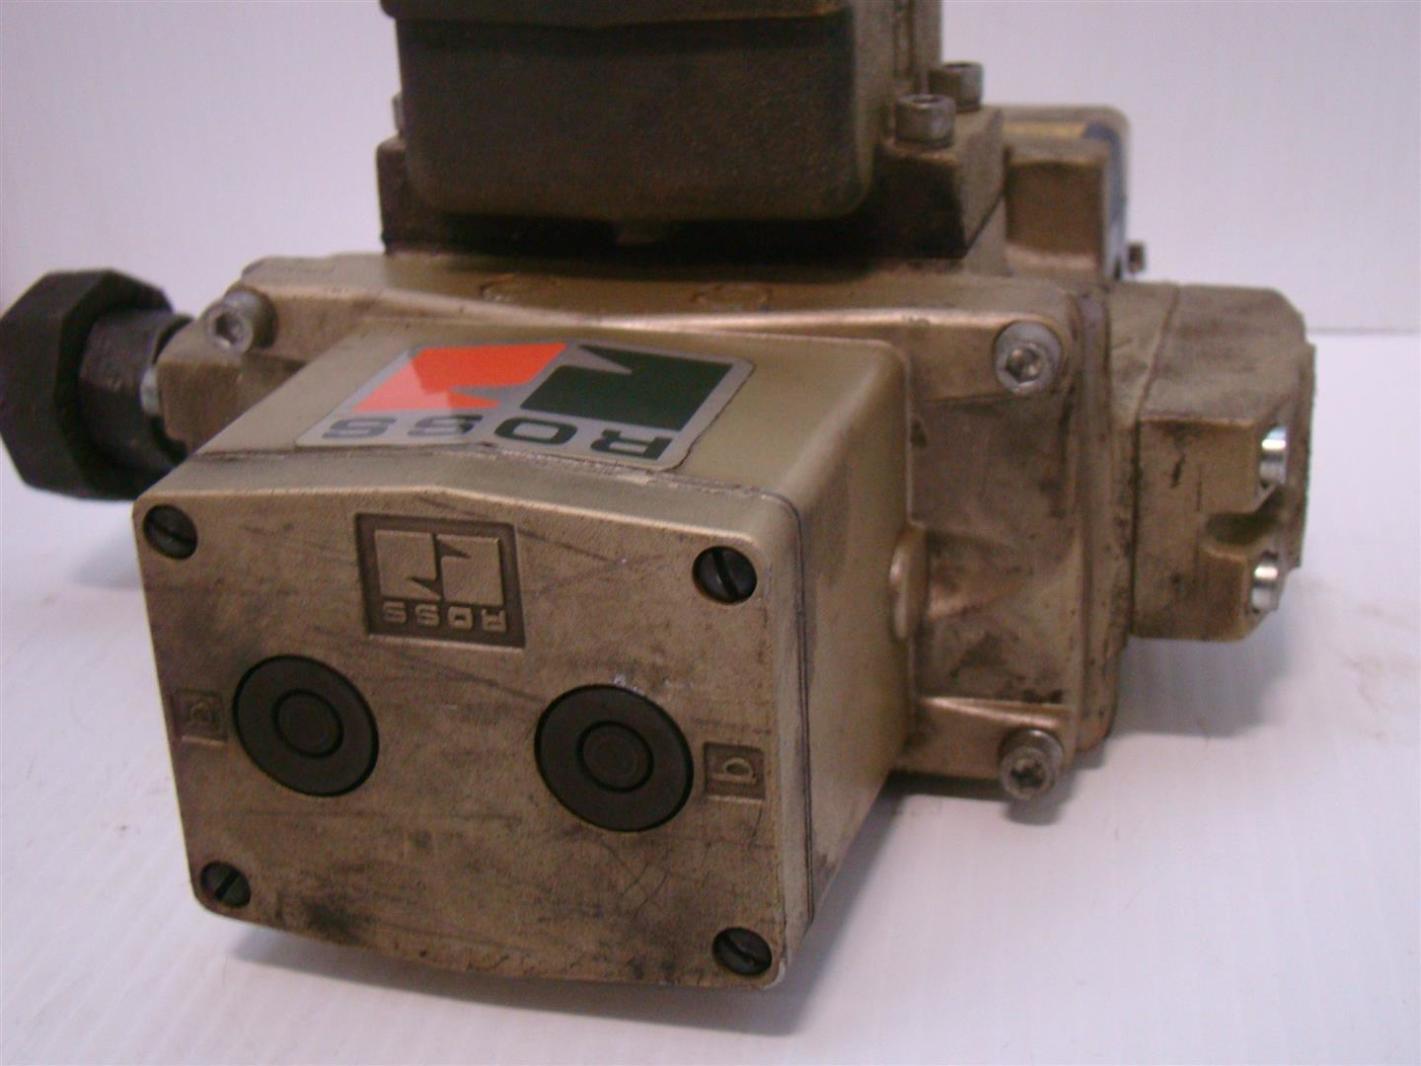 Ross 26va 110 120v 2 3573a5141 joseph fazzio for Ross hydraulic motor seal kit